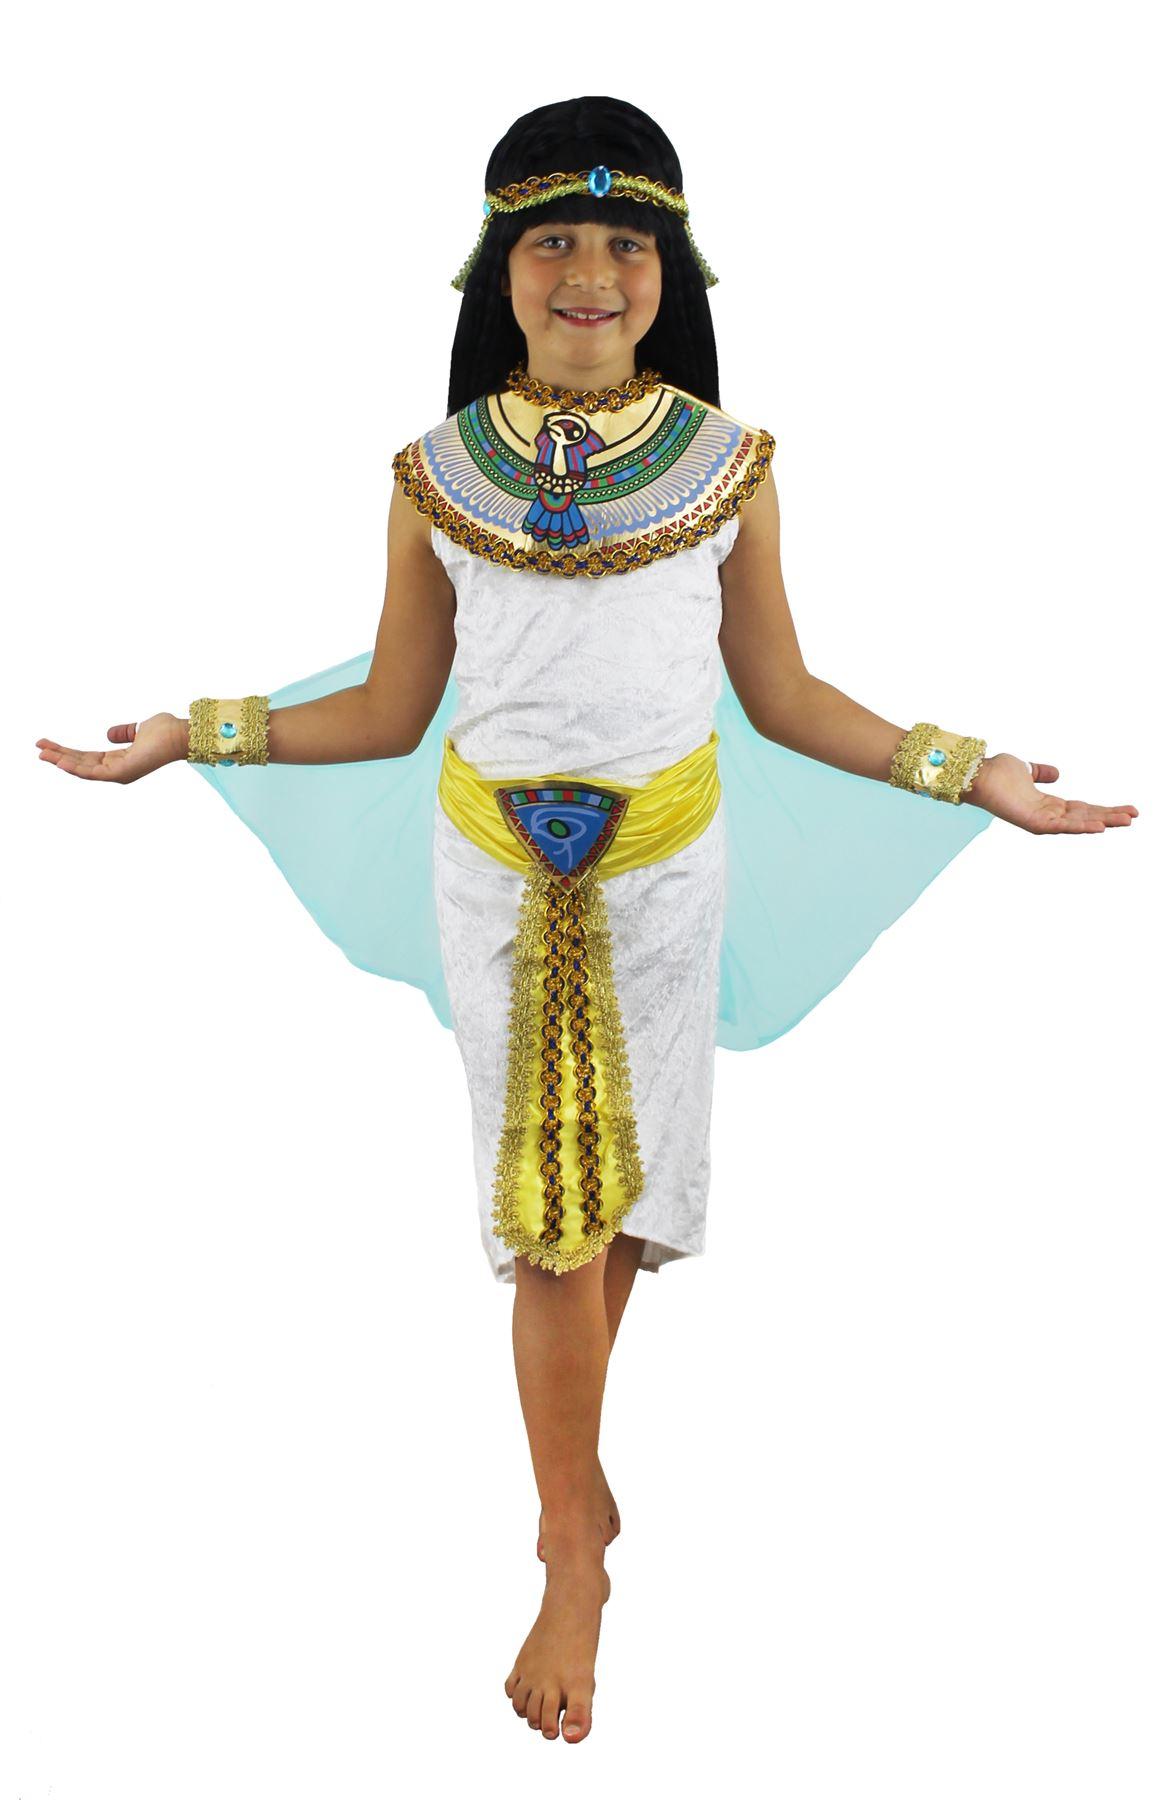 Cleopatra Fasching Kostum Damen Kleopatra Pharaonin Modell W 0045c